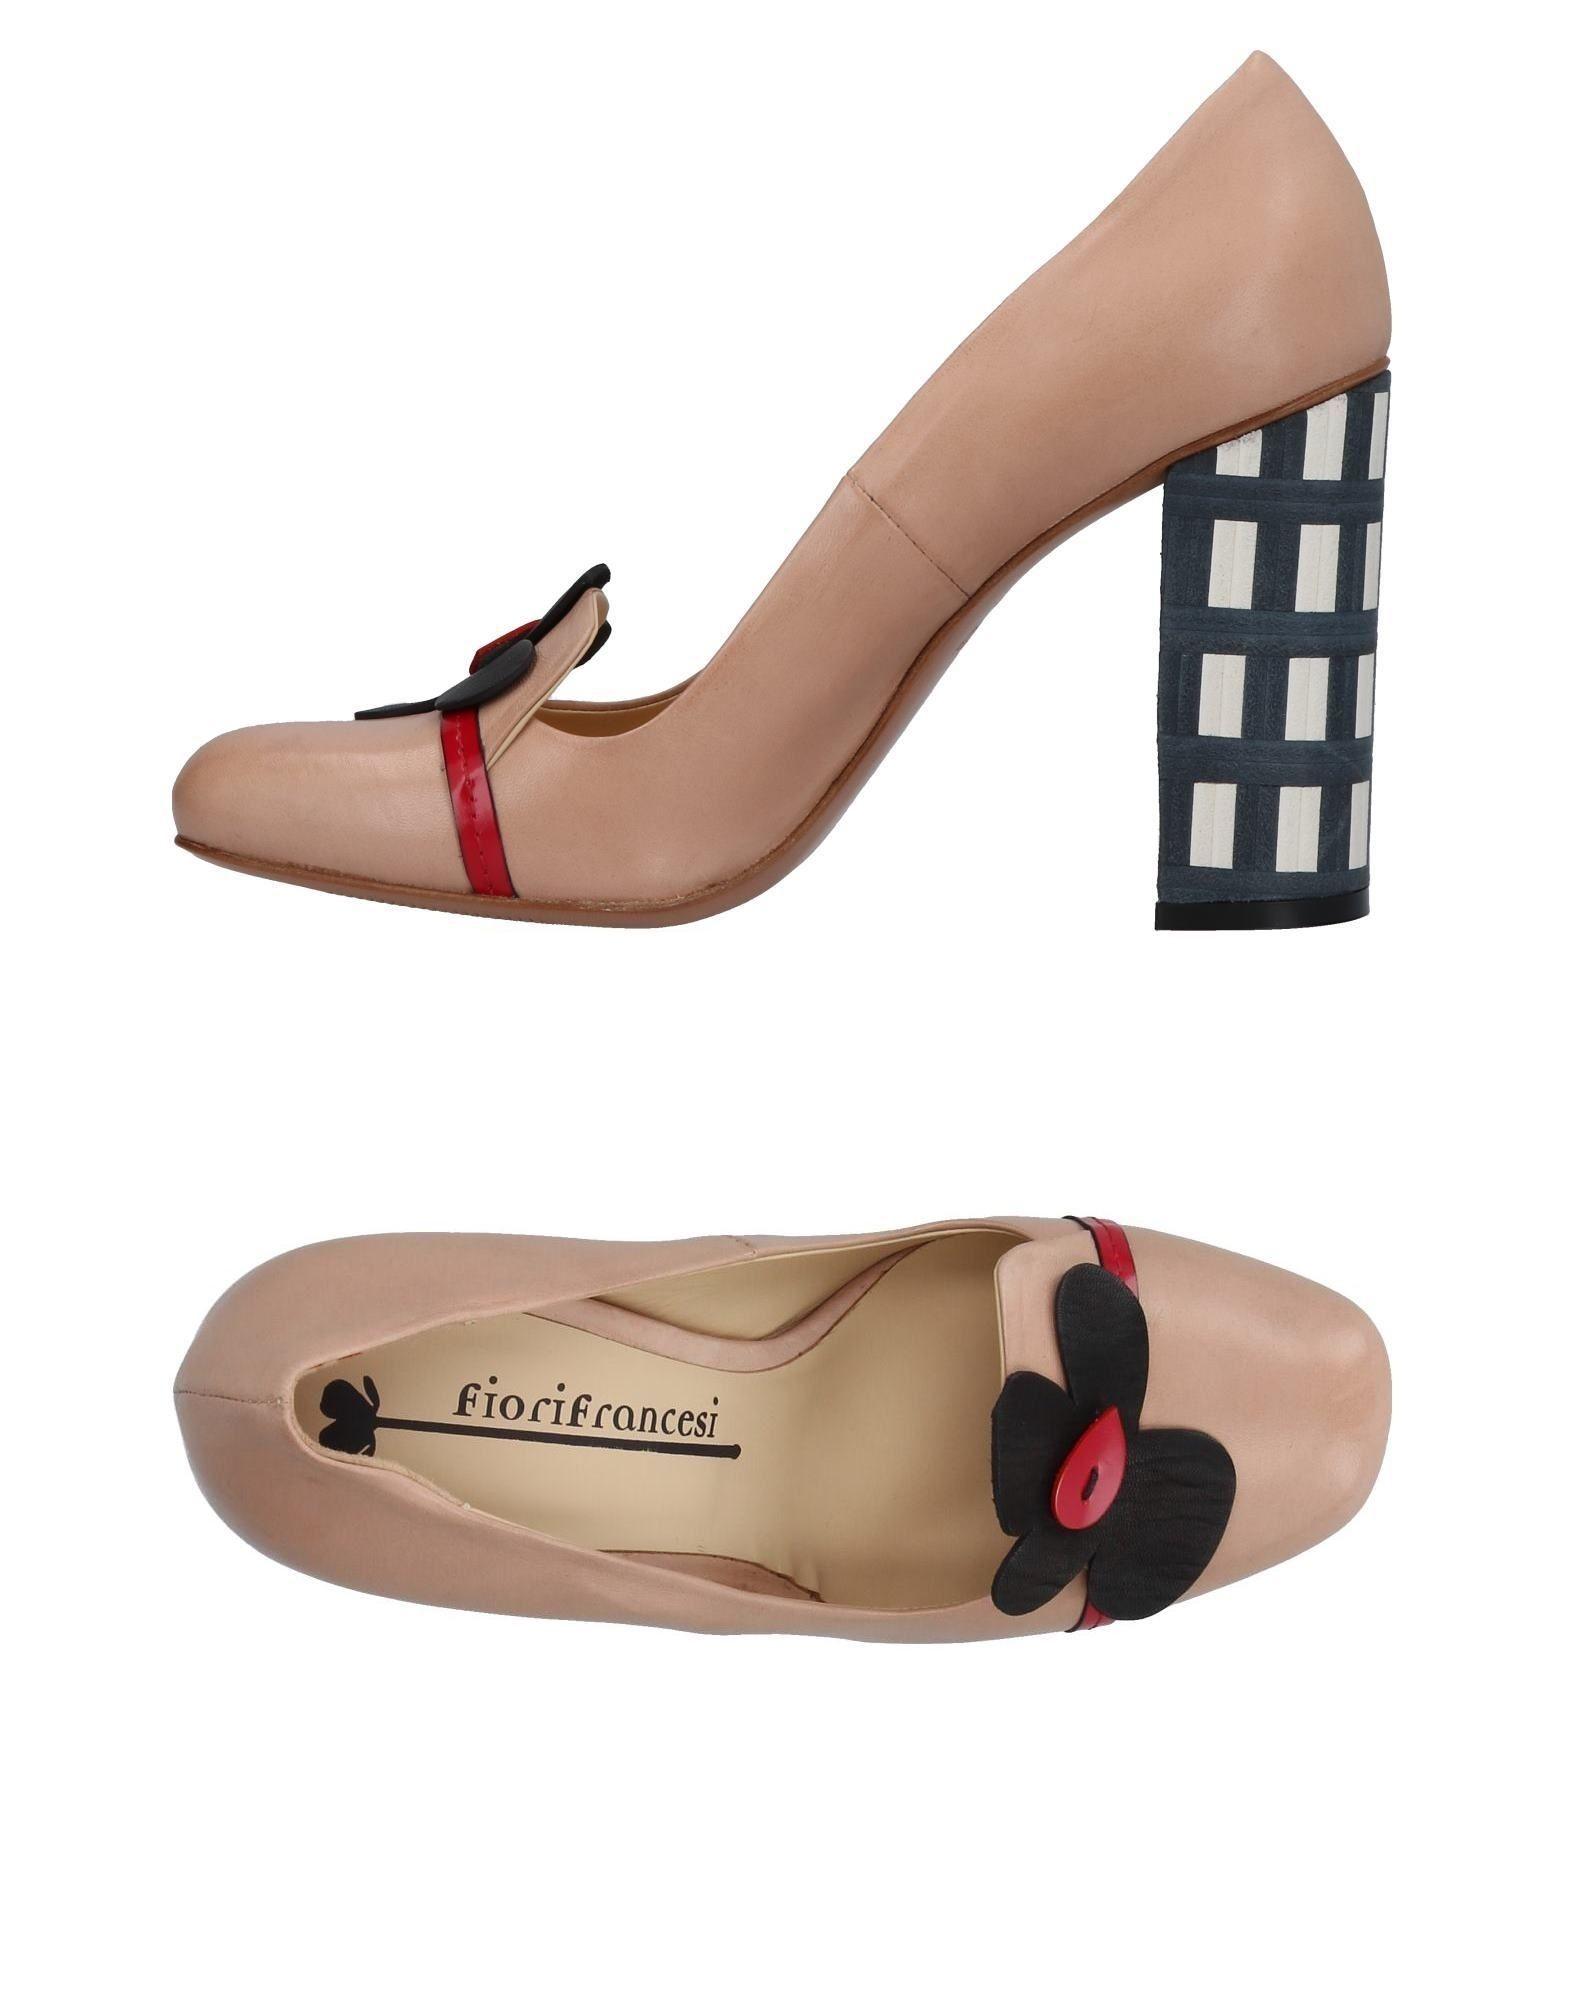 FOOTWEAR - Sandals Fiorifrancesi 1zB2xyduJ